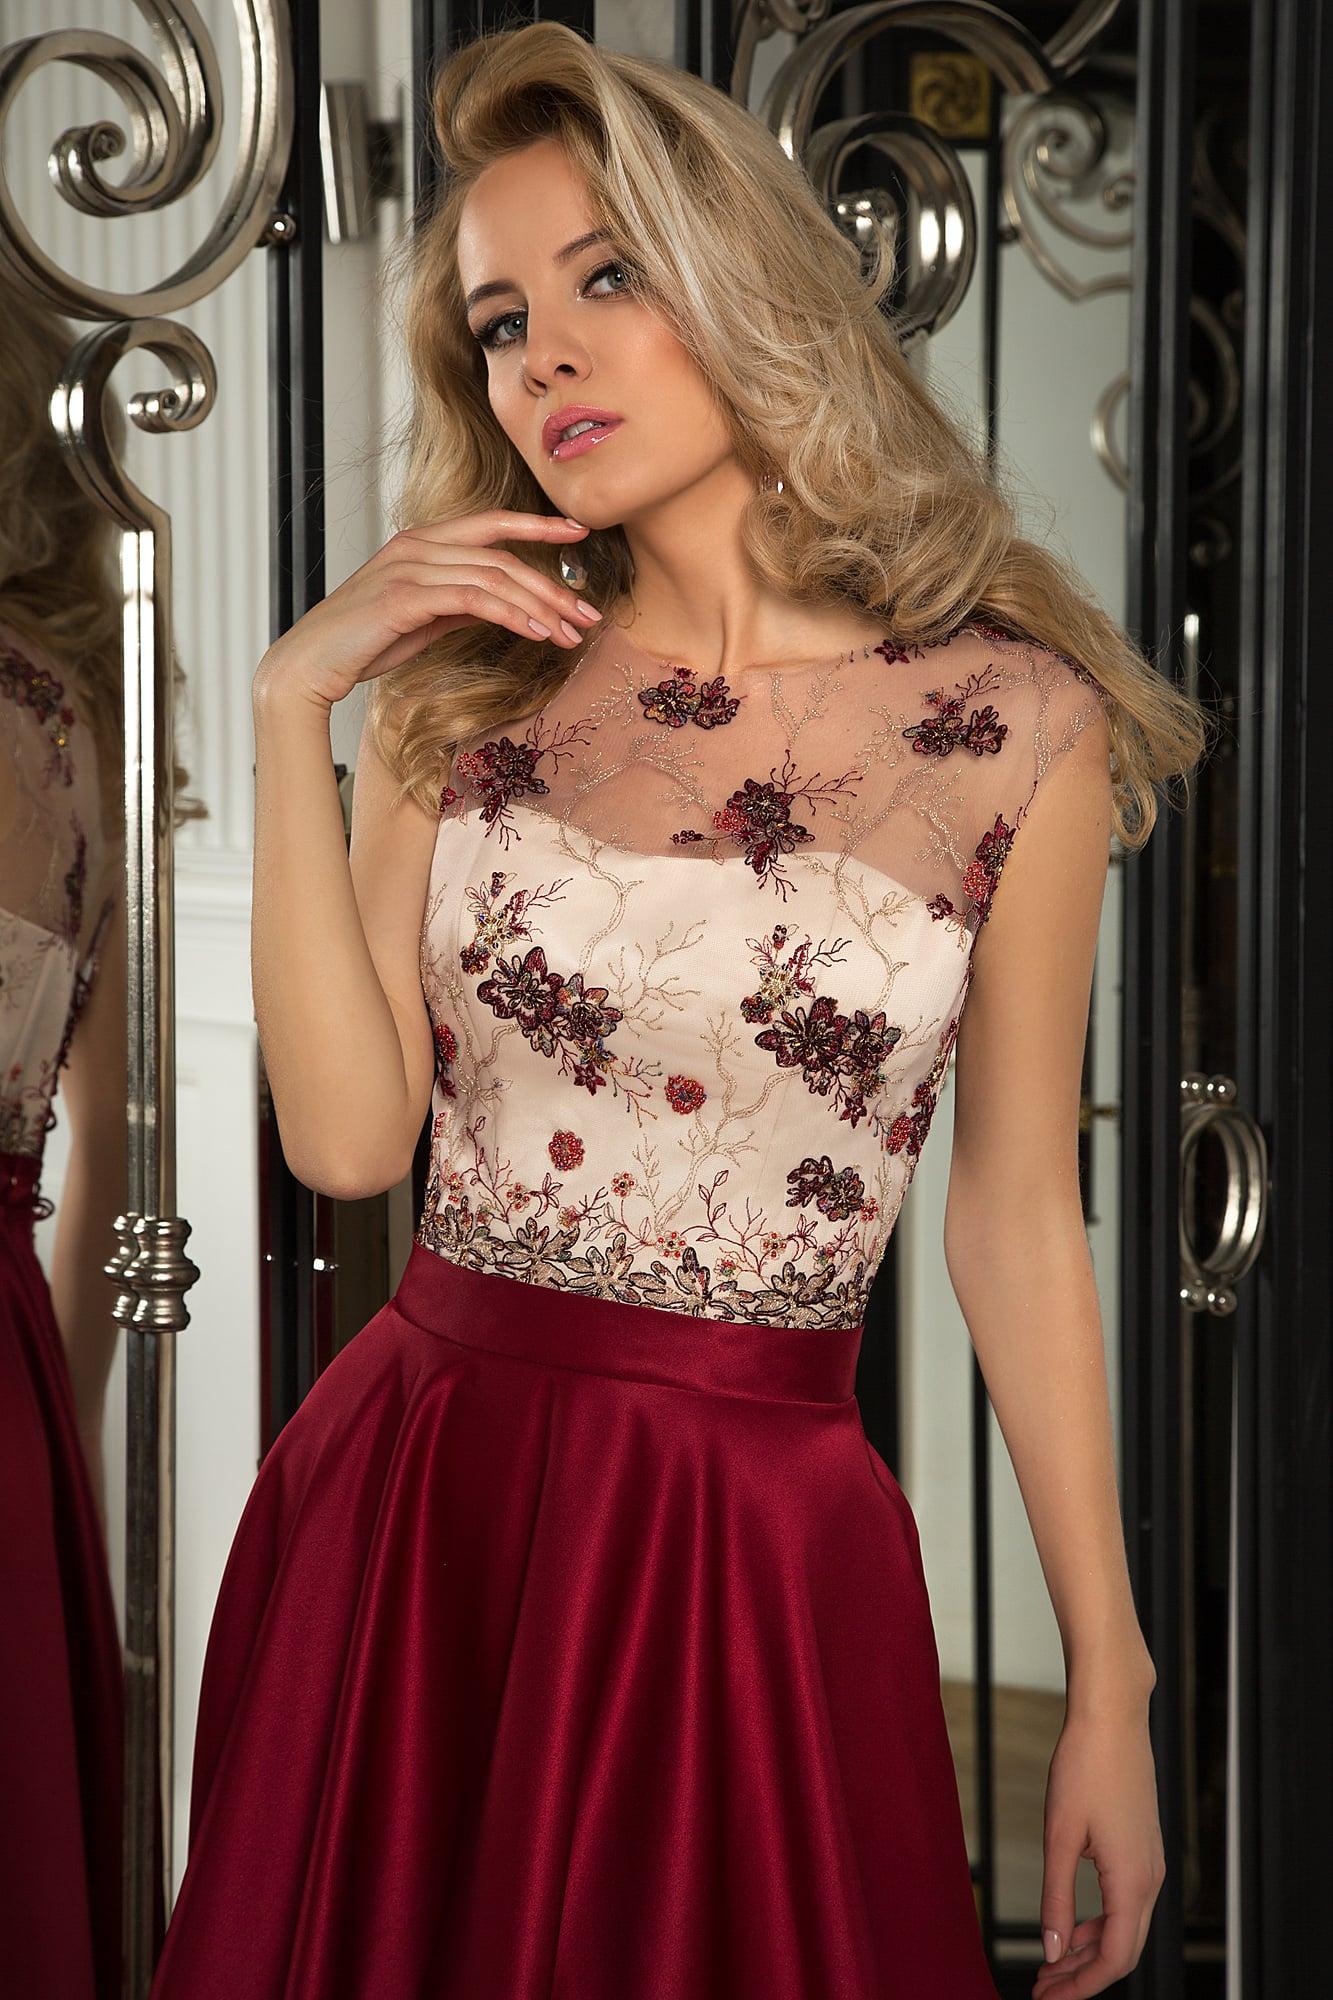 c5a8d7adc2b  shop 16-1051   shop 16-1054 . Oksana Mukha 2017   16-1053. Вечернее платье  смотрится изысканно ...